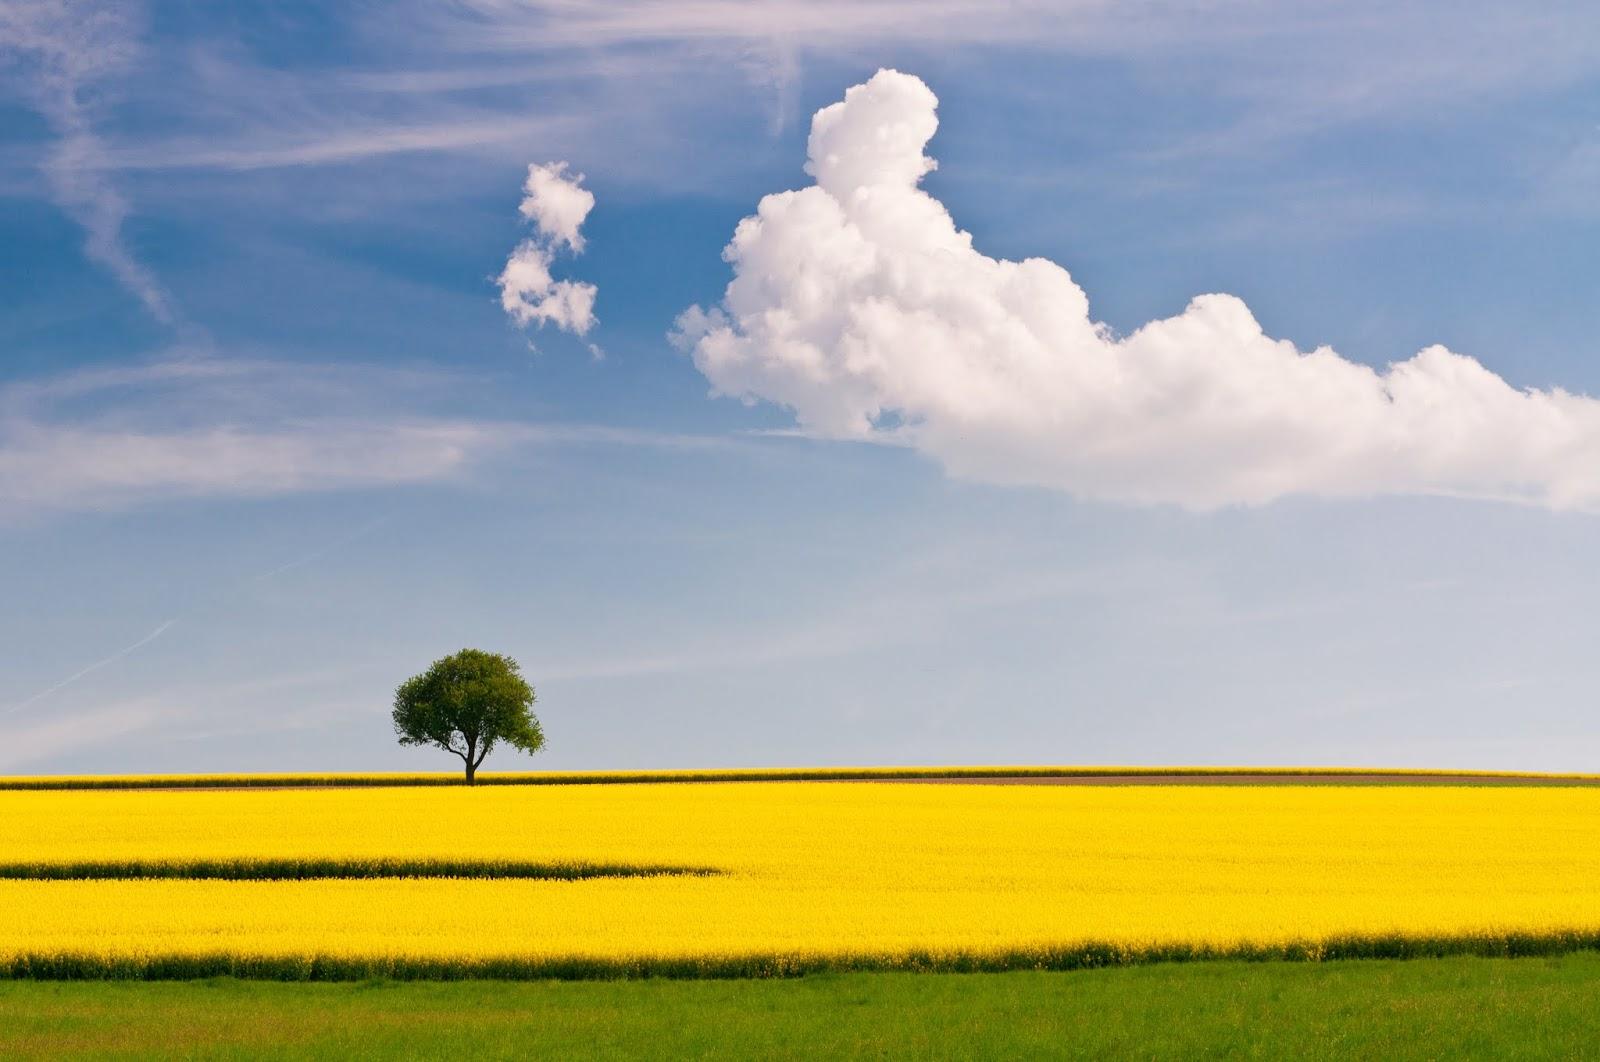 Memaksimalkan Komposisi Foto Landscape horison rata